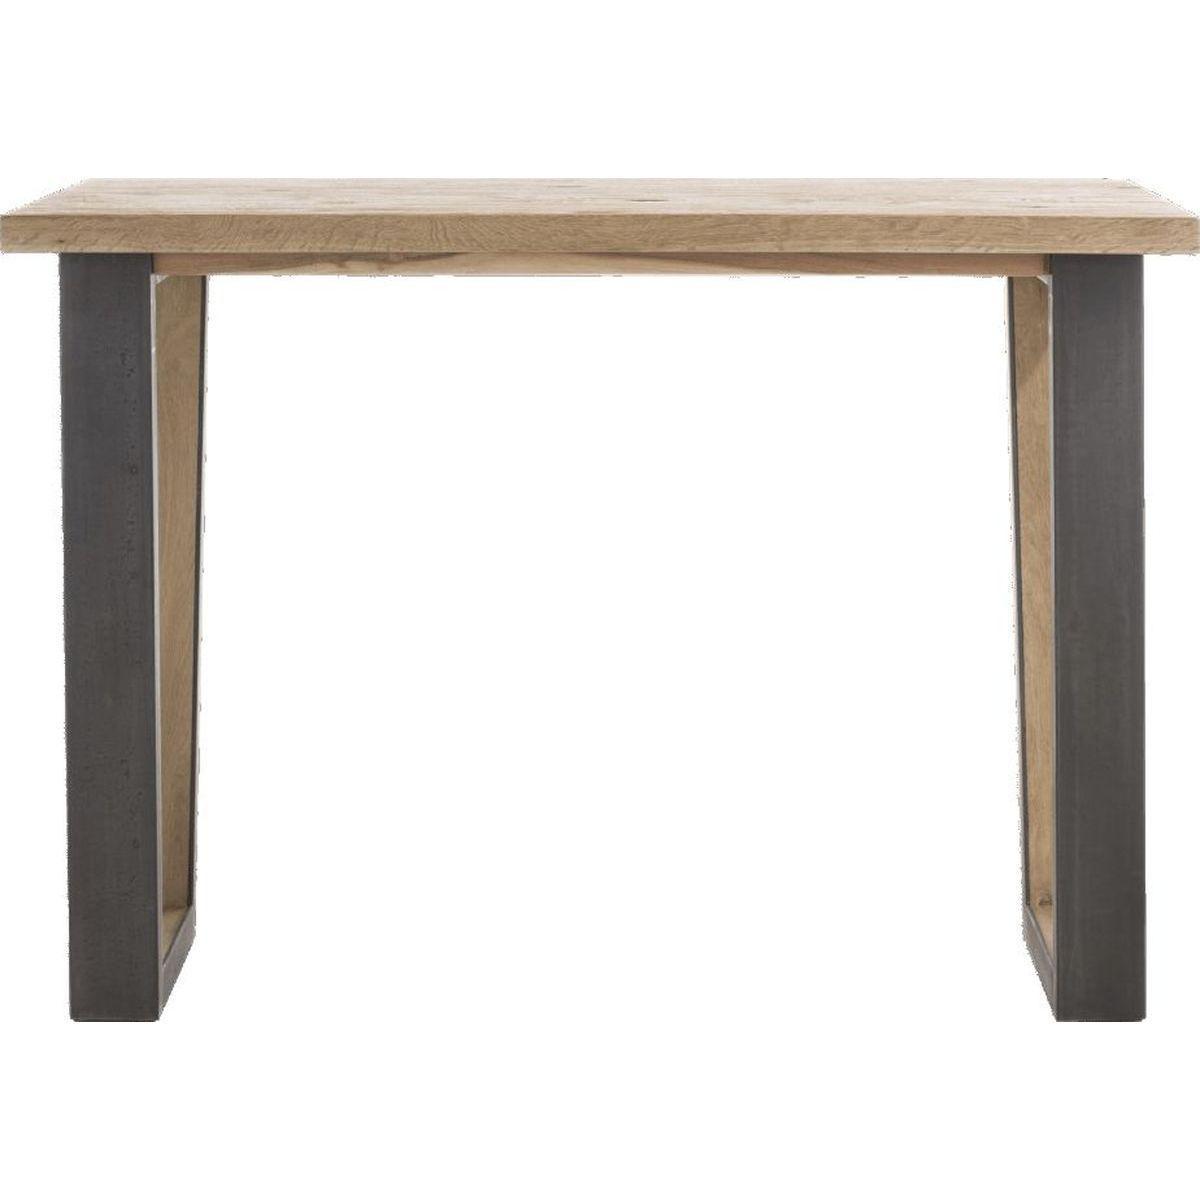 Table de bar METALOX HetH 130x90cm